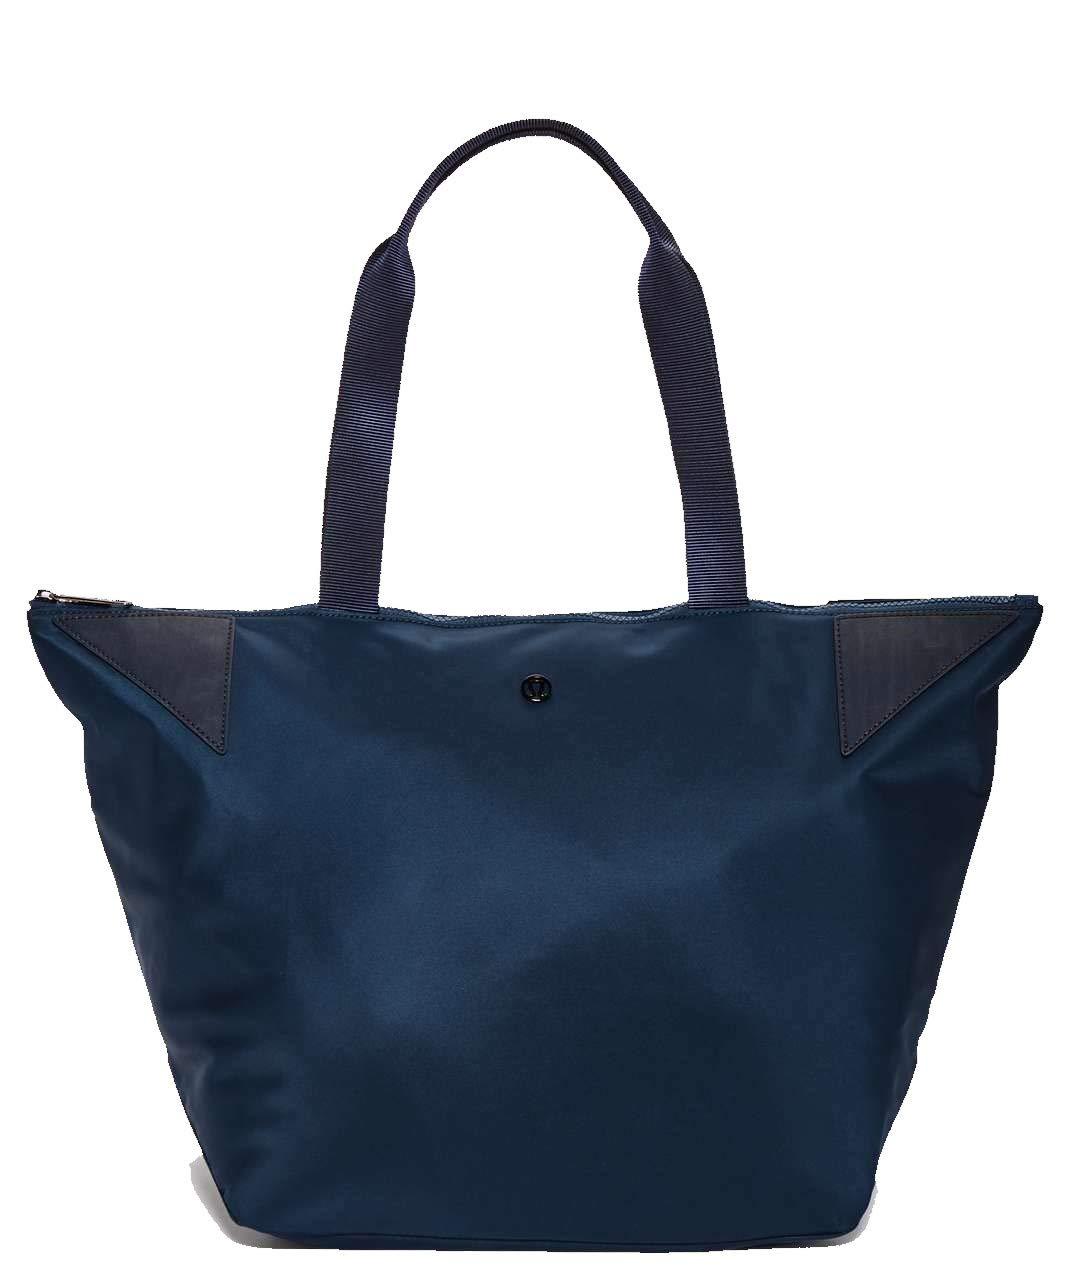 Lululemon ACUTE TOTE 23L Bag Mineral Blue Midnight Navy MINB MDNI (Mineral Blue Midnight Navy) by Lululemon